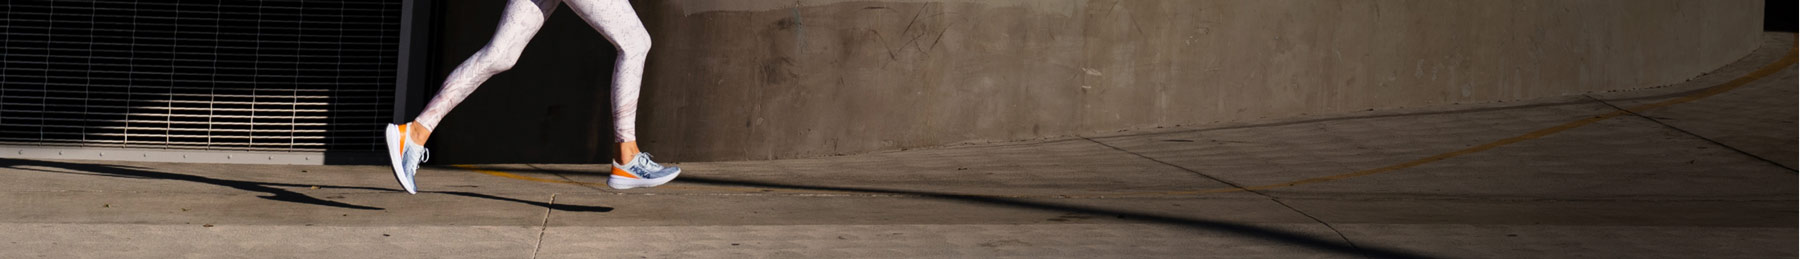 Woman running down road by concrete wall wearing HOKA shoes.